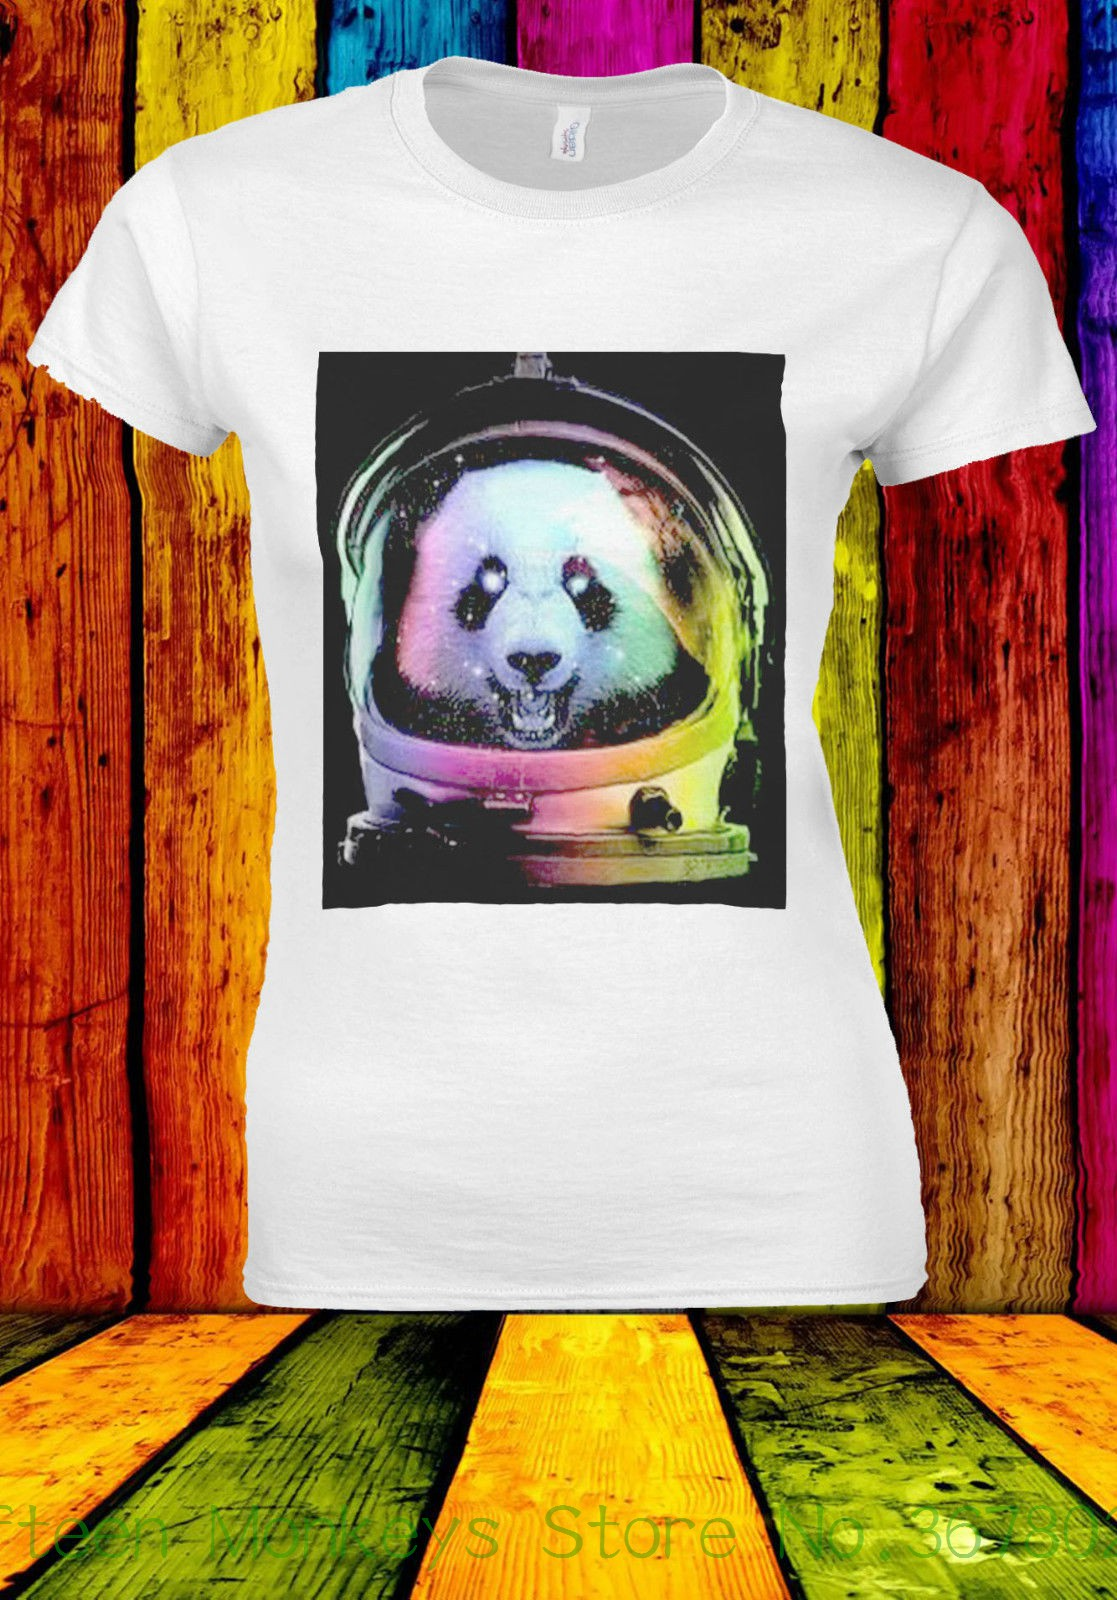 Astronaut Panda Bear Funny Space T-shirt Vest Tank Top Men Women Unisex 2450